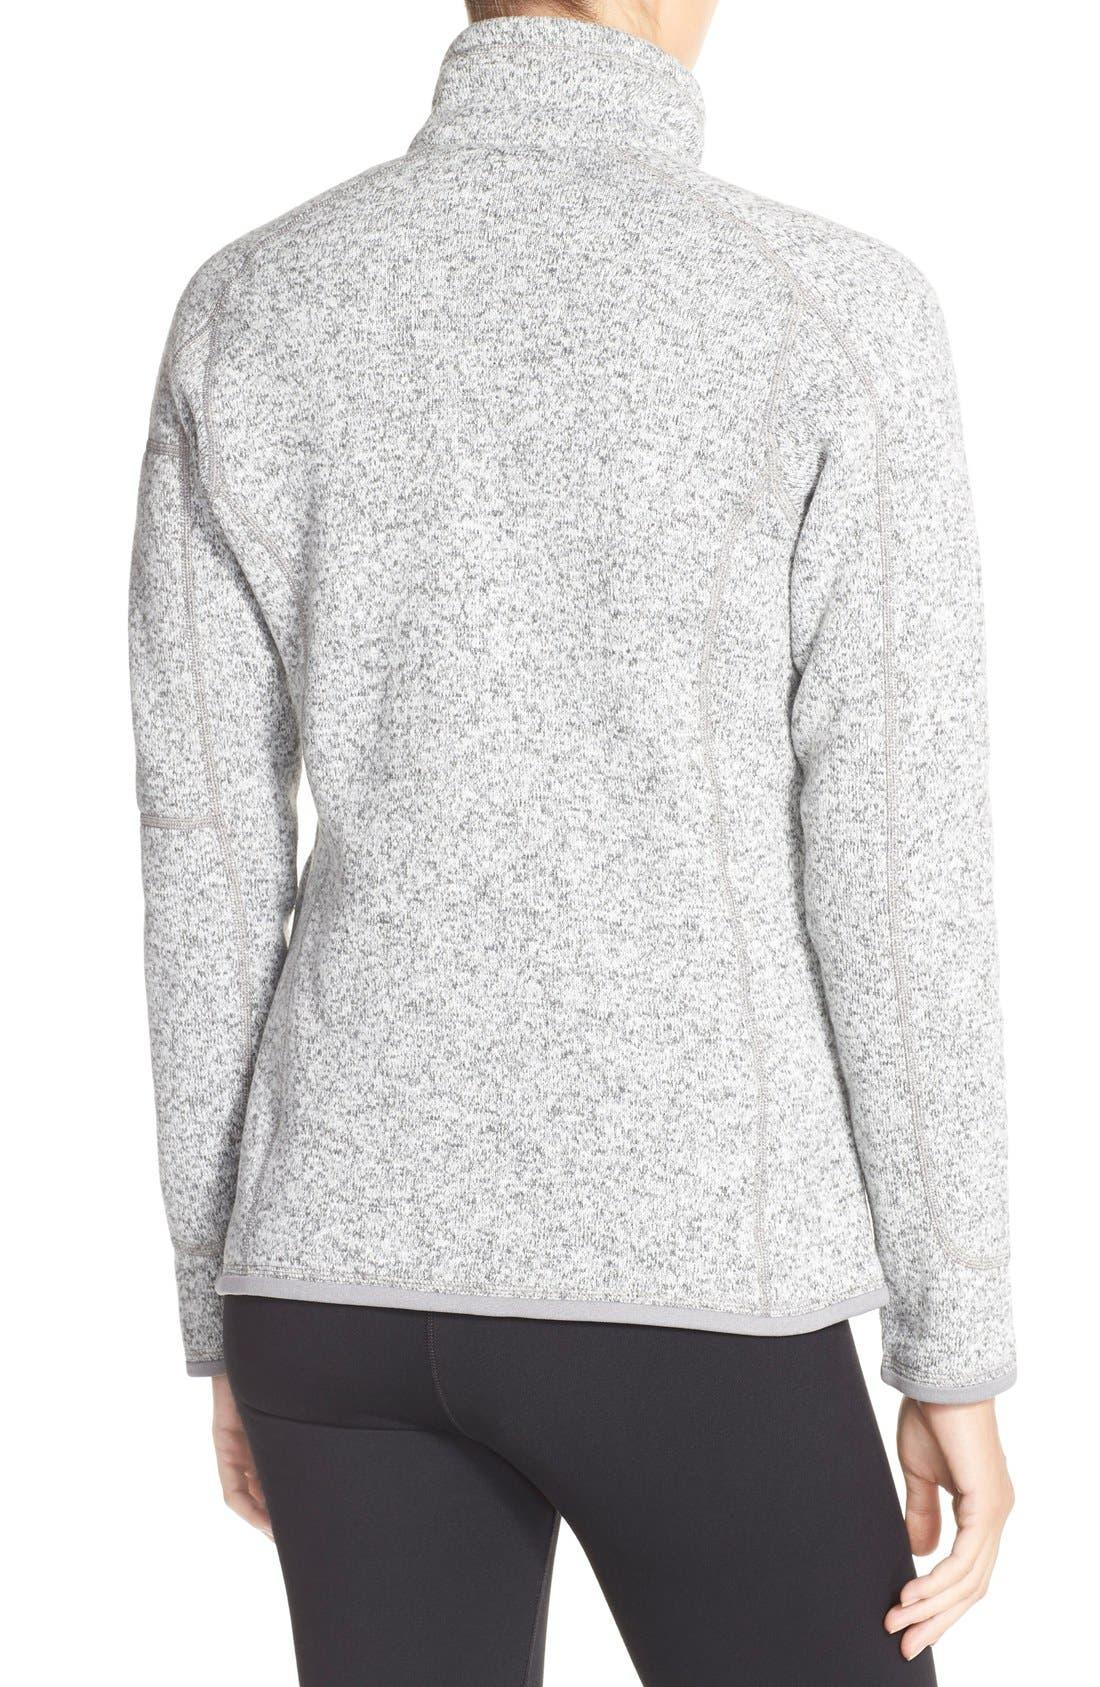 'BetterSweater' Jacket,                             Alternate thumbnail 3, color,                             BIRCH WHITE